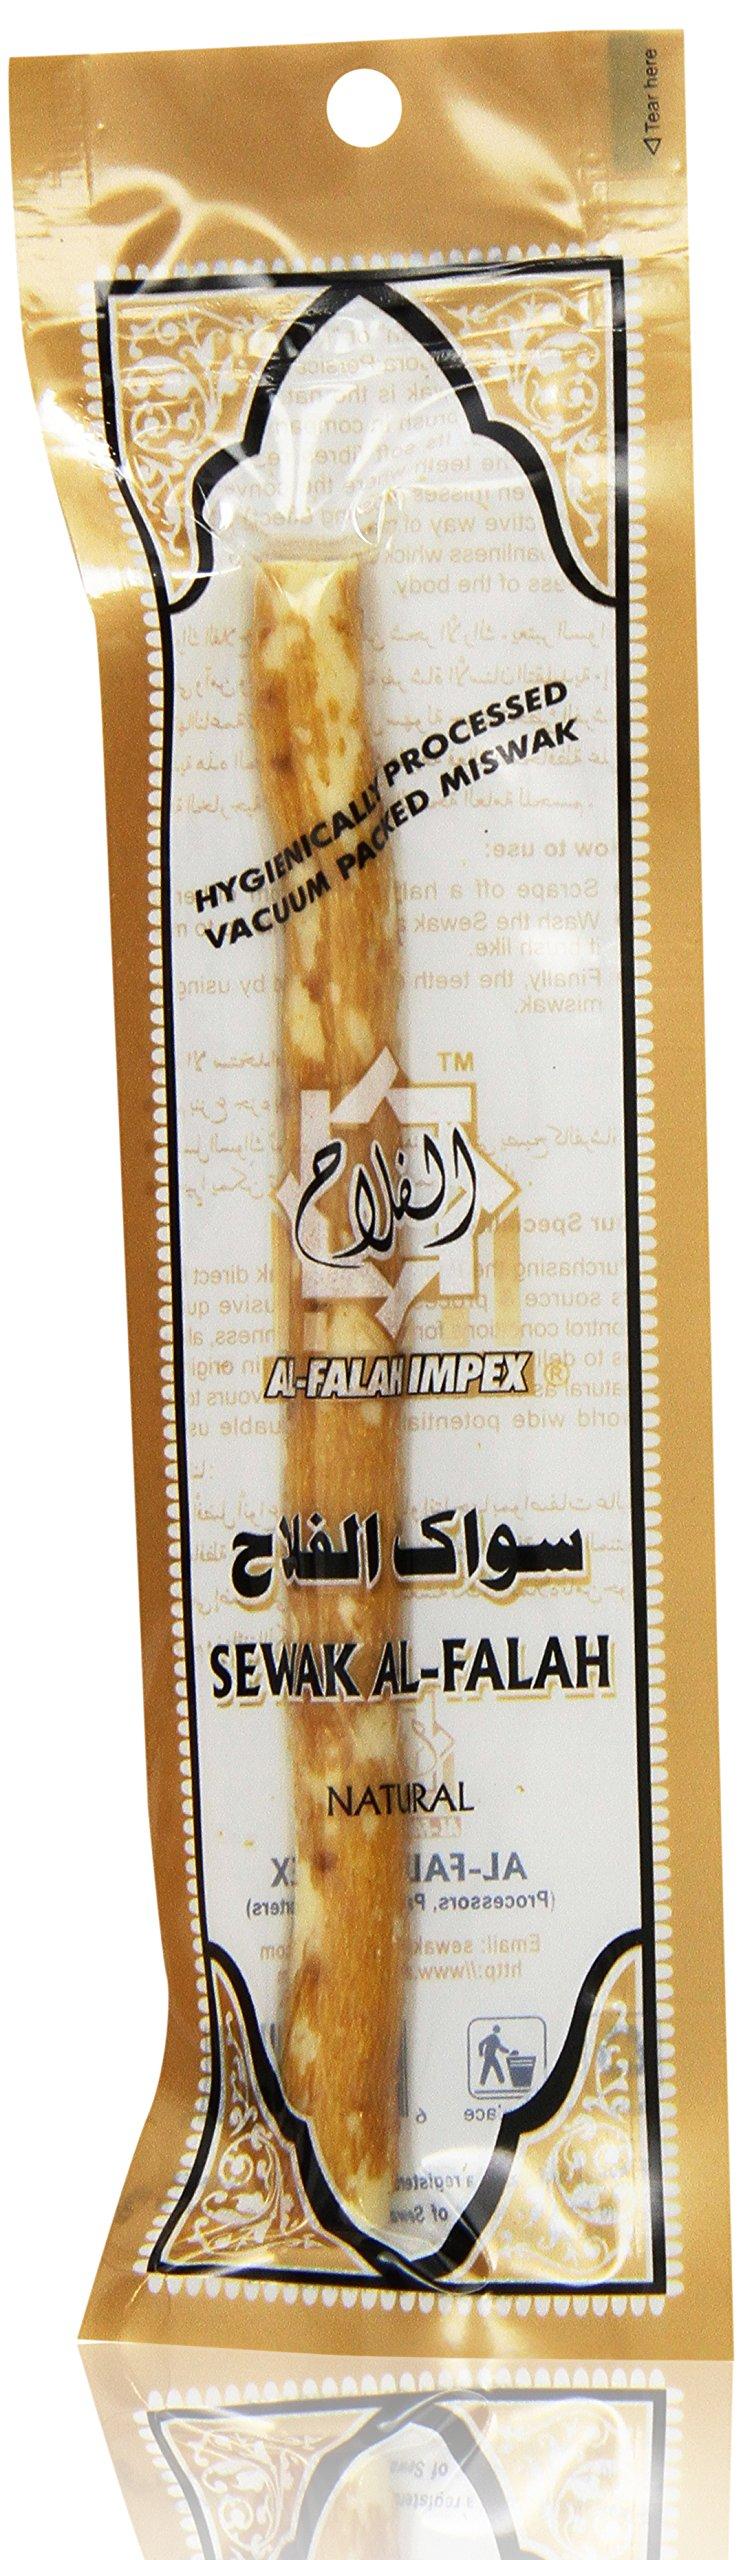 Miswak Stick - Sewak Al-Falah - Hygienically Processed and Vacummed Packed - Box of 60 Individual Sticks by Al Falah